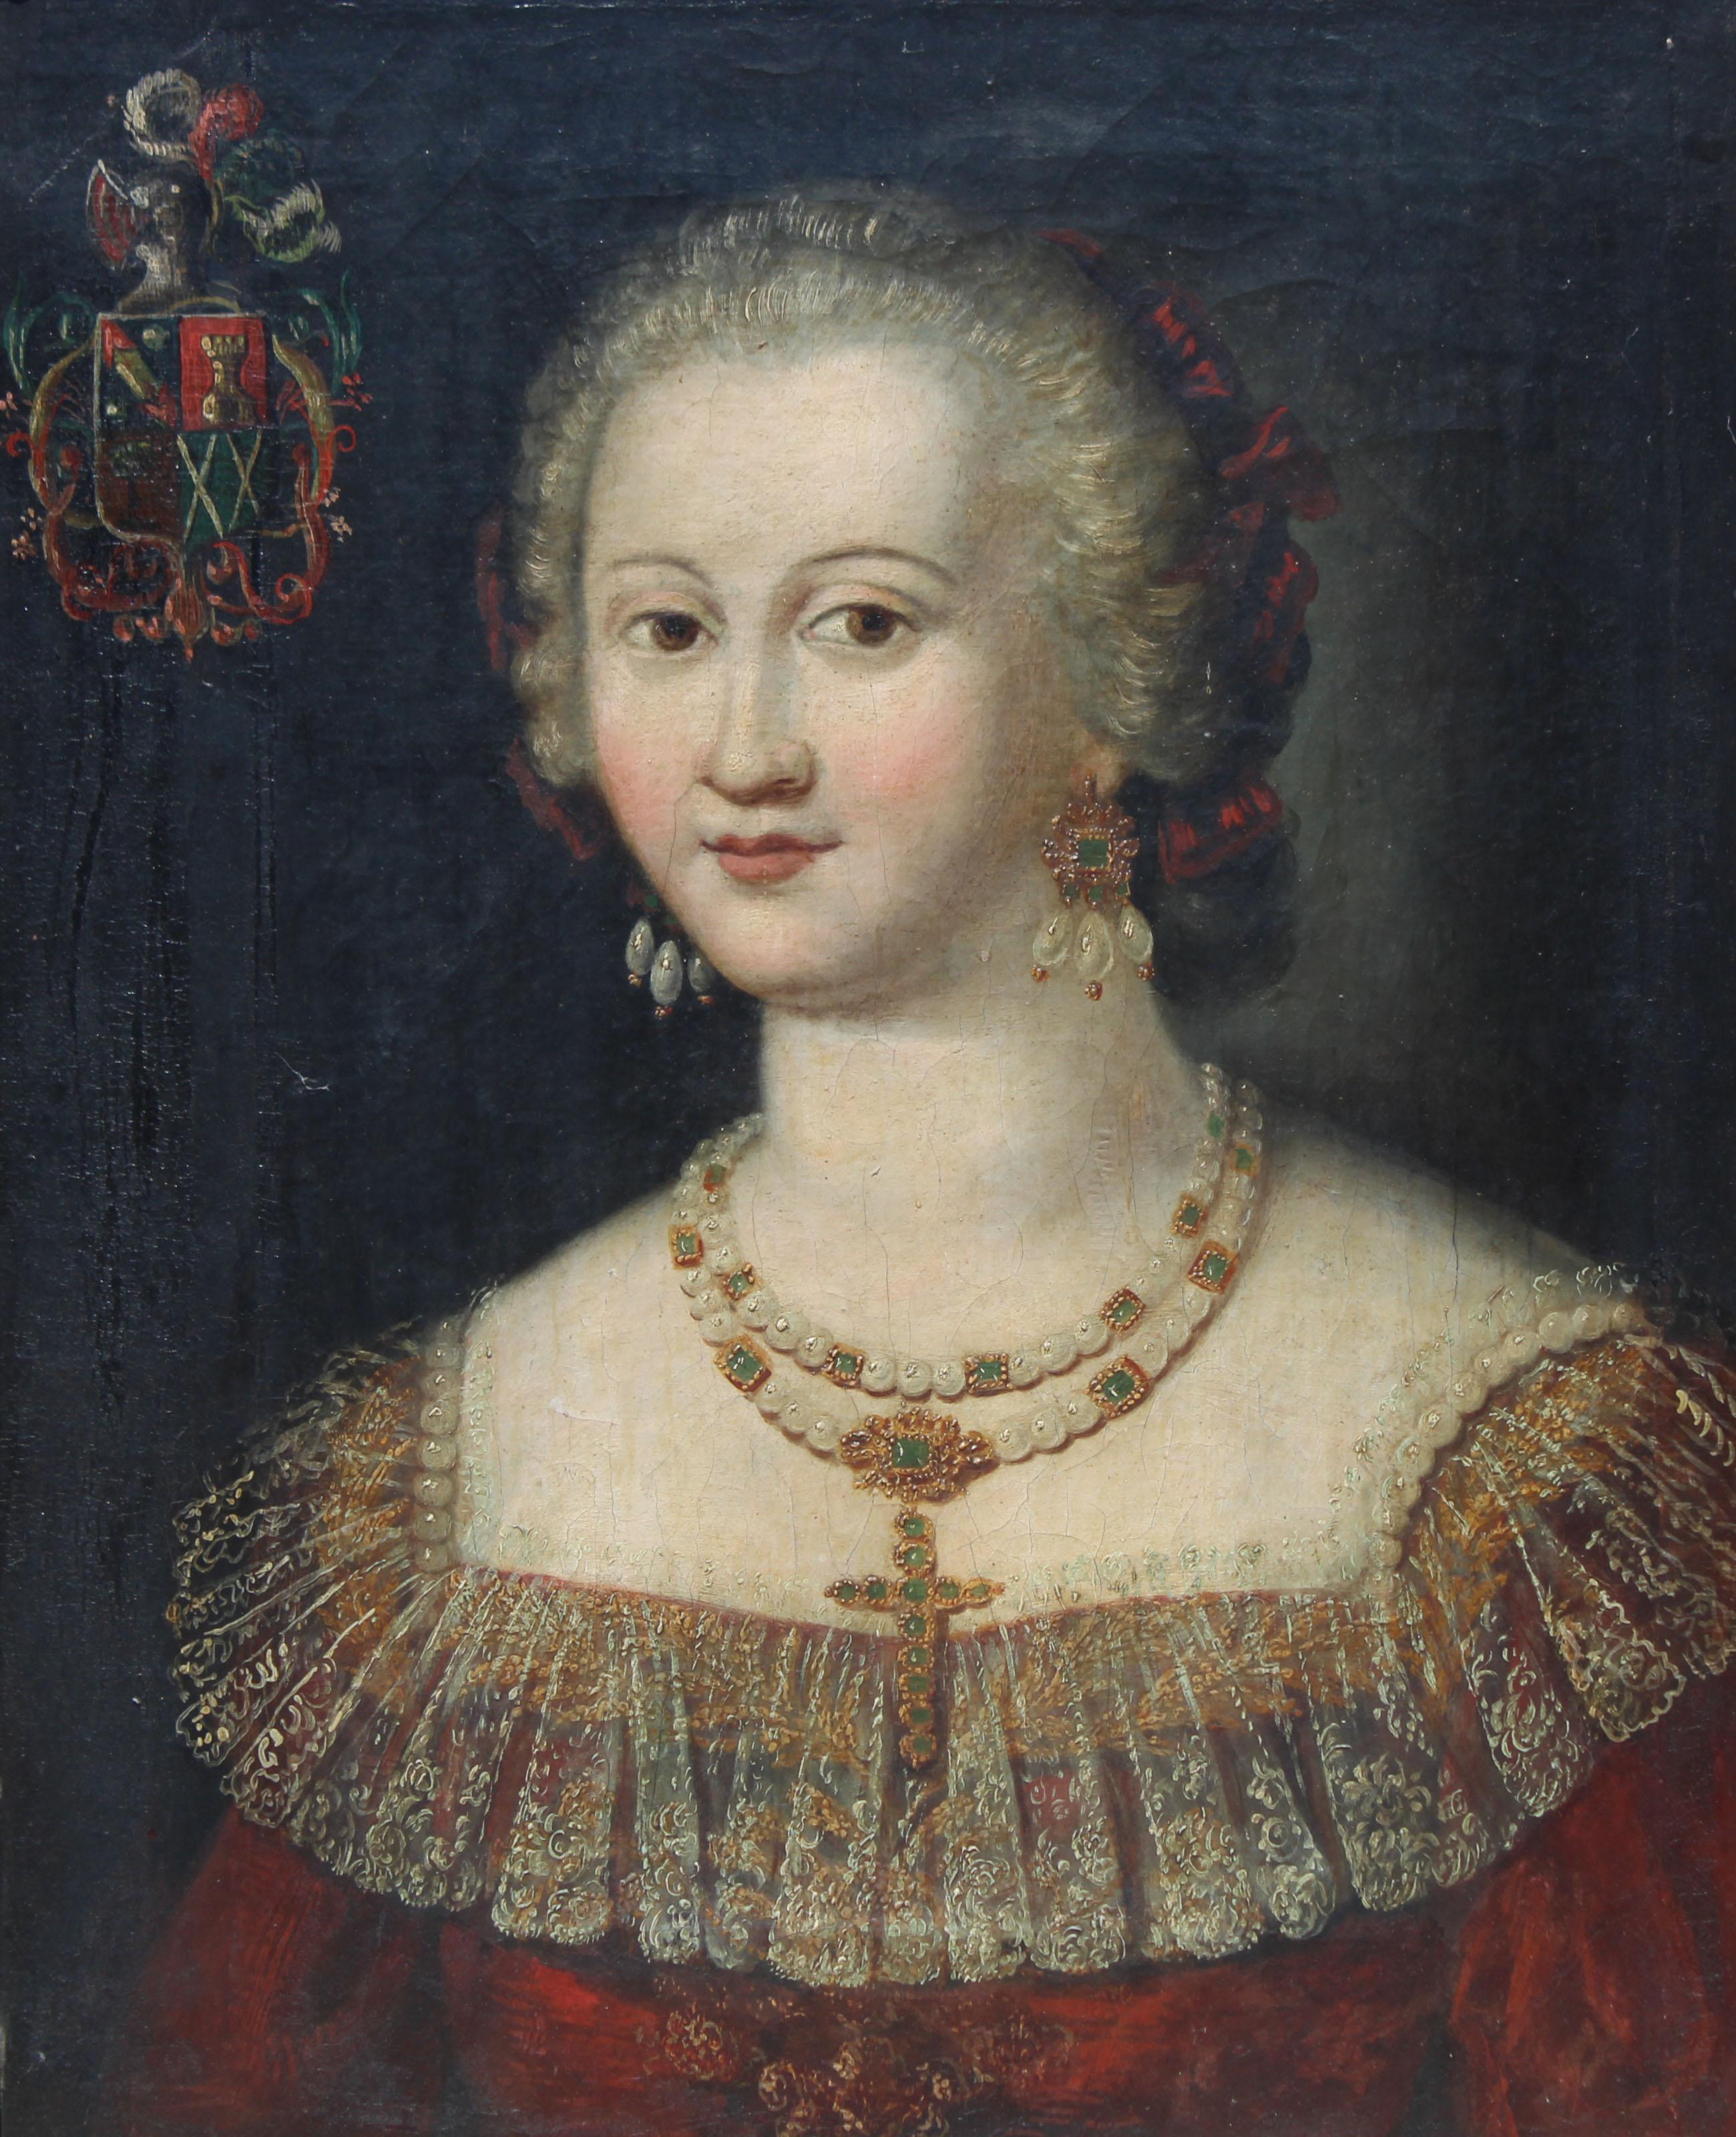 Lot 20 - 17th C. Spanish School Portrait of a Woman